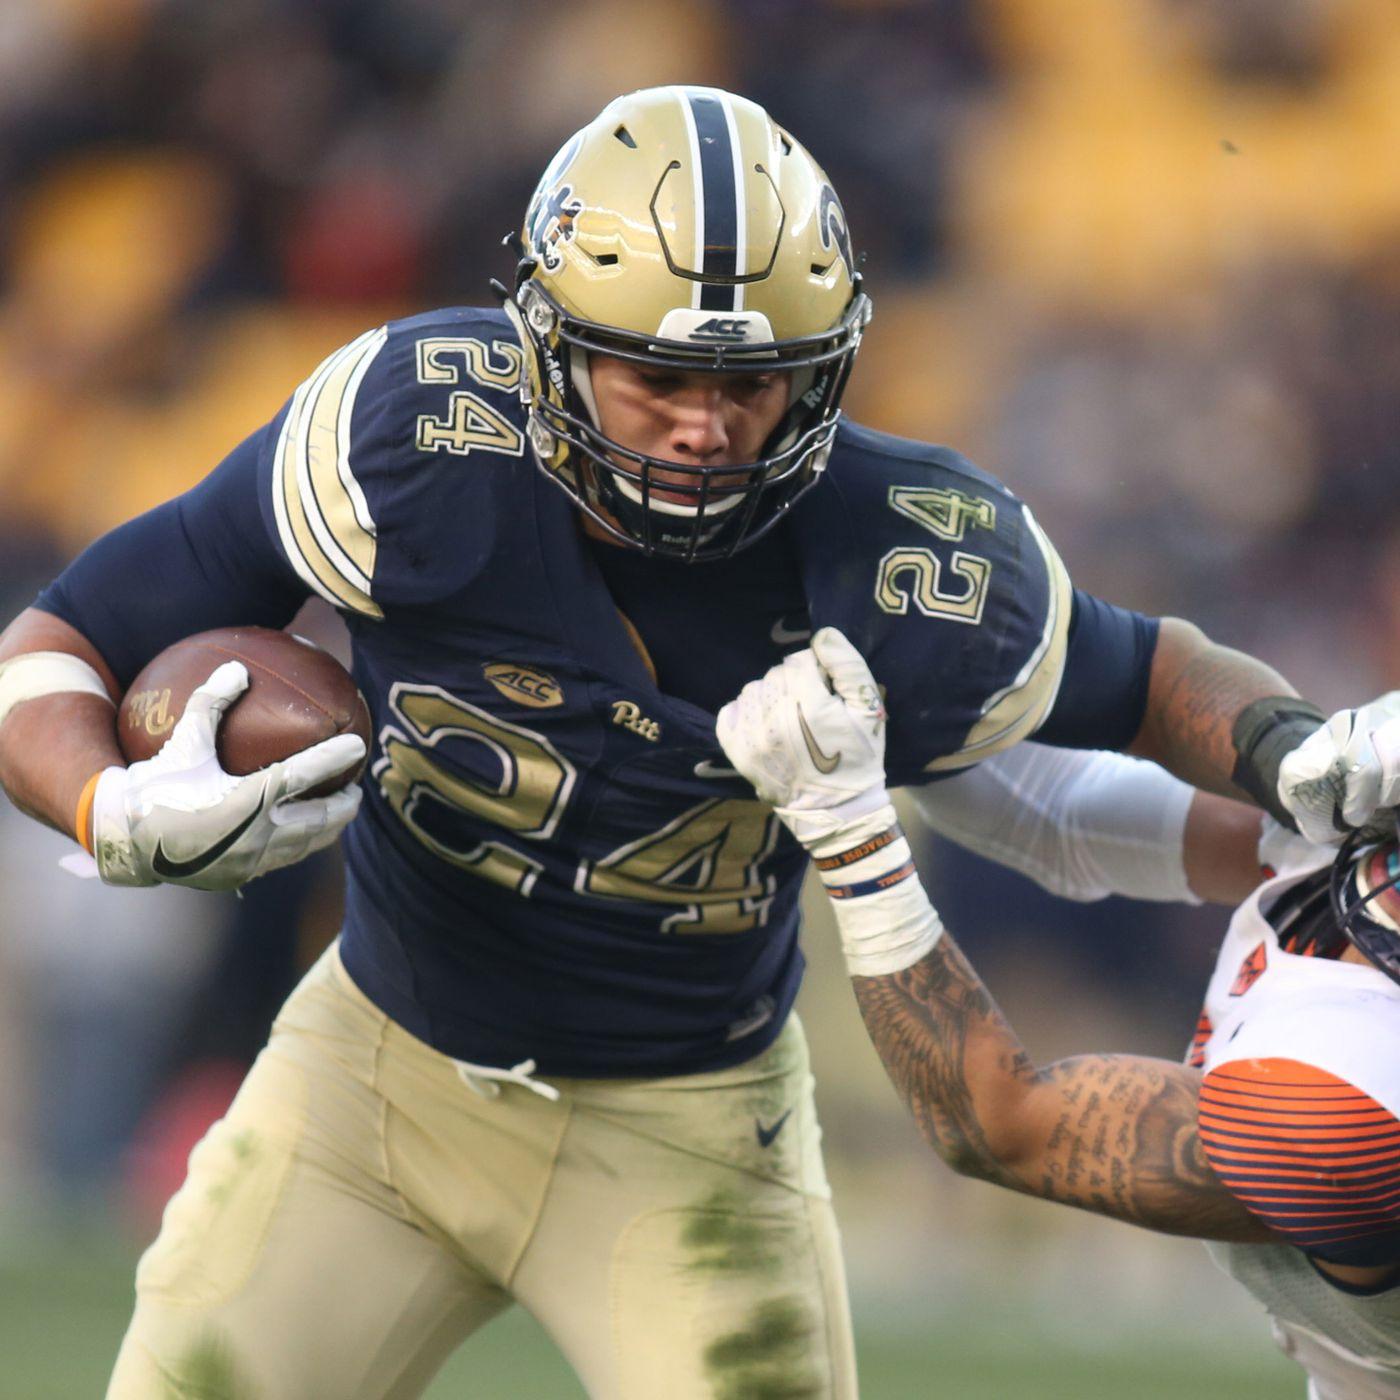 Pitt Beat Syracuse In The Highest Scoring Major College Football